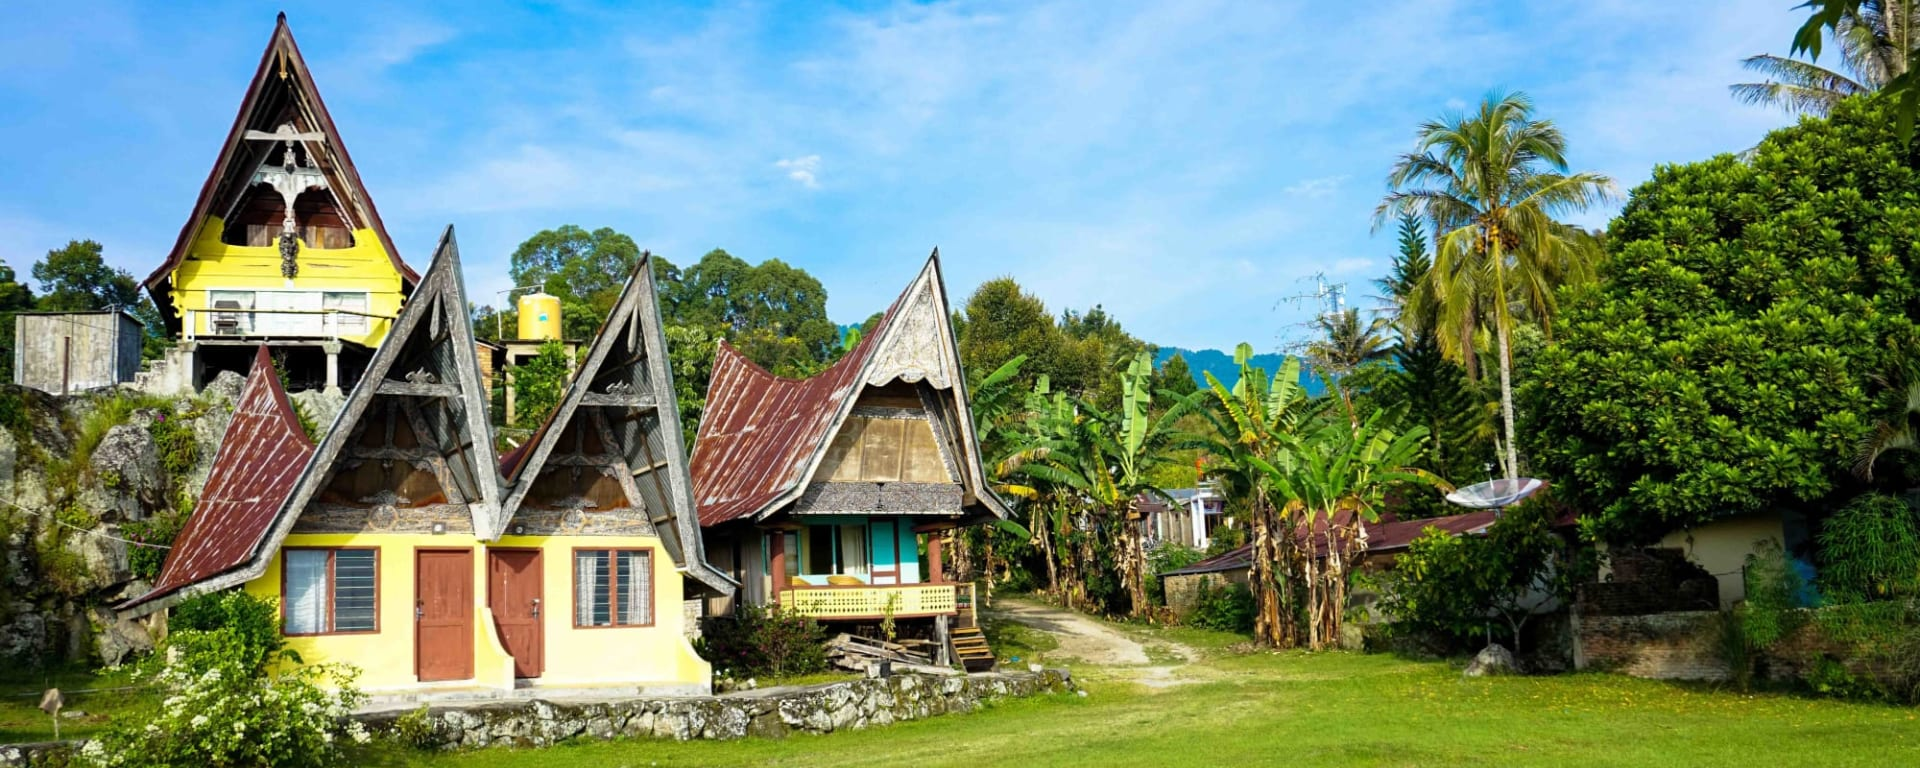 Überlandreise Sumatra ab Medan: Indonesien Sumatra Toba See Karo Dorf